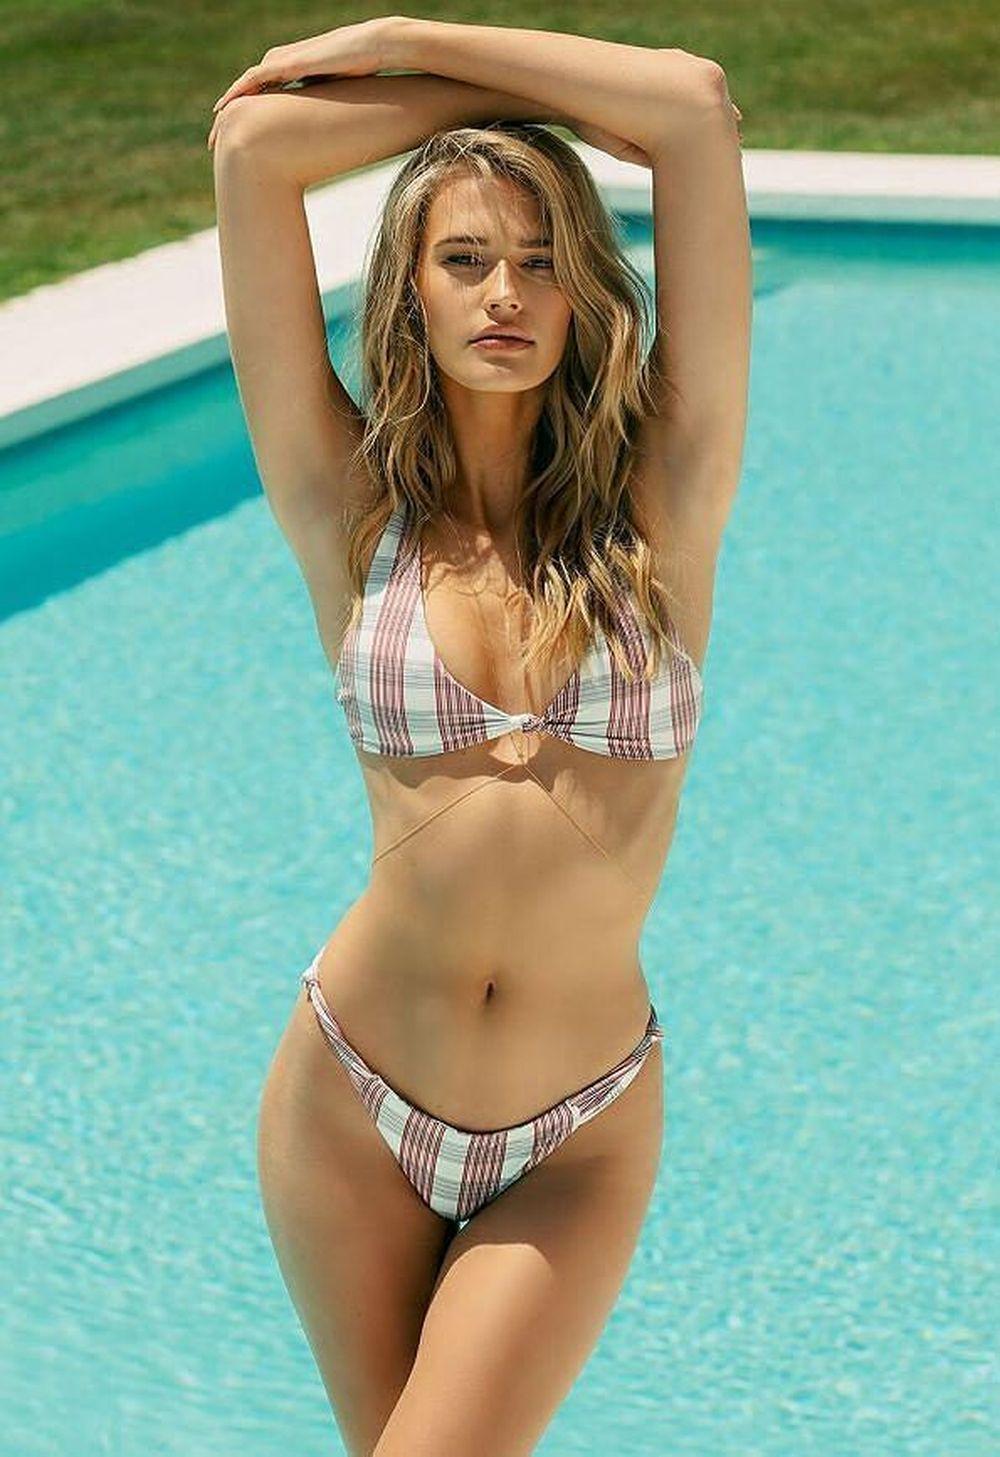 ICloud Eva Amurri nude photos 2019